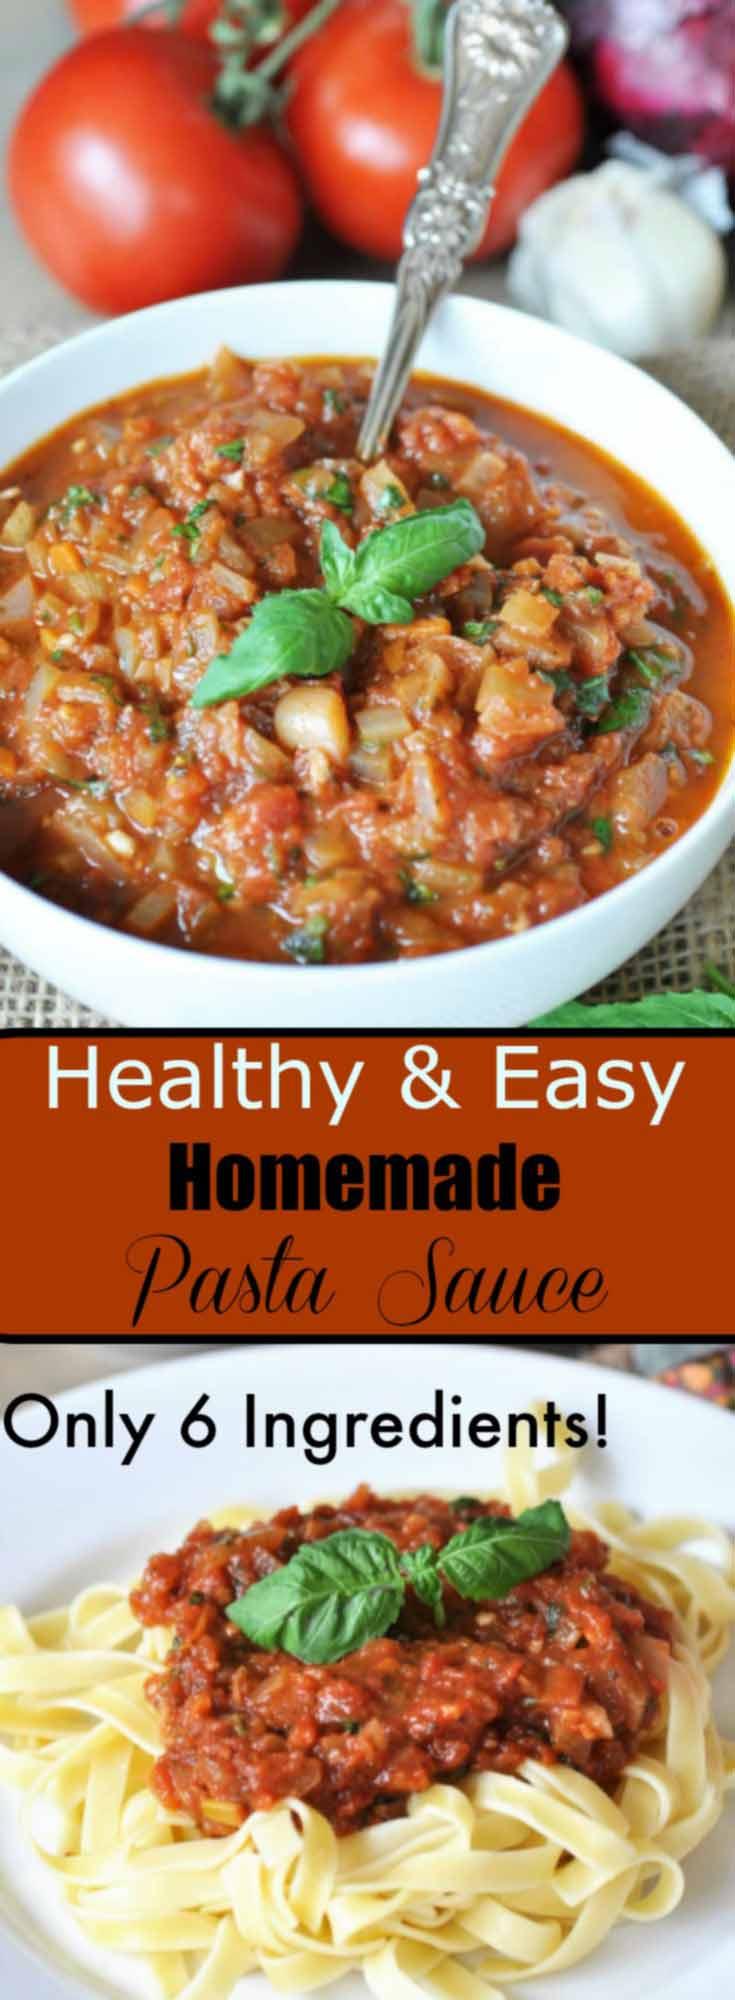 how to make homemade pasta sauce